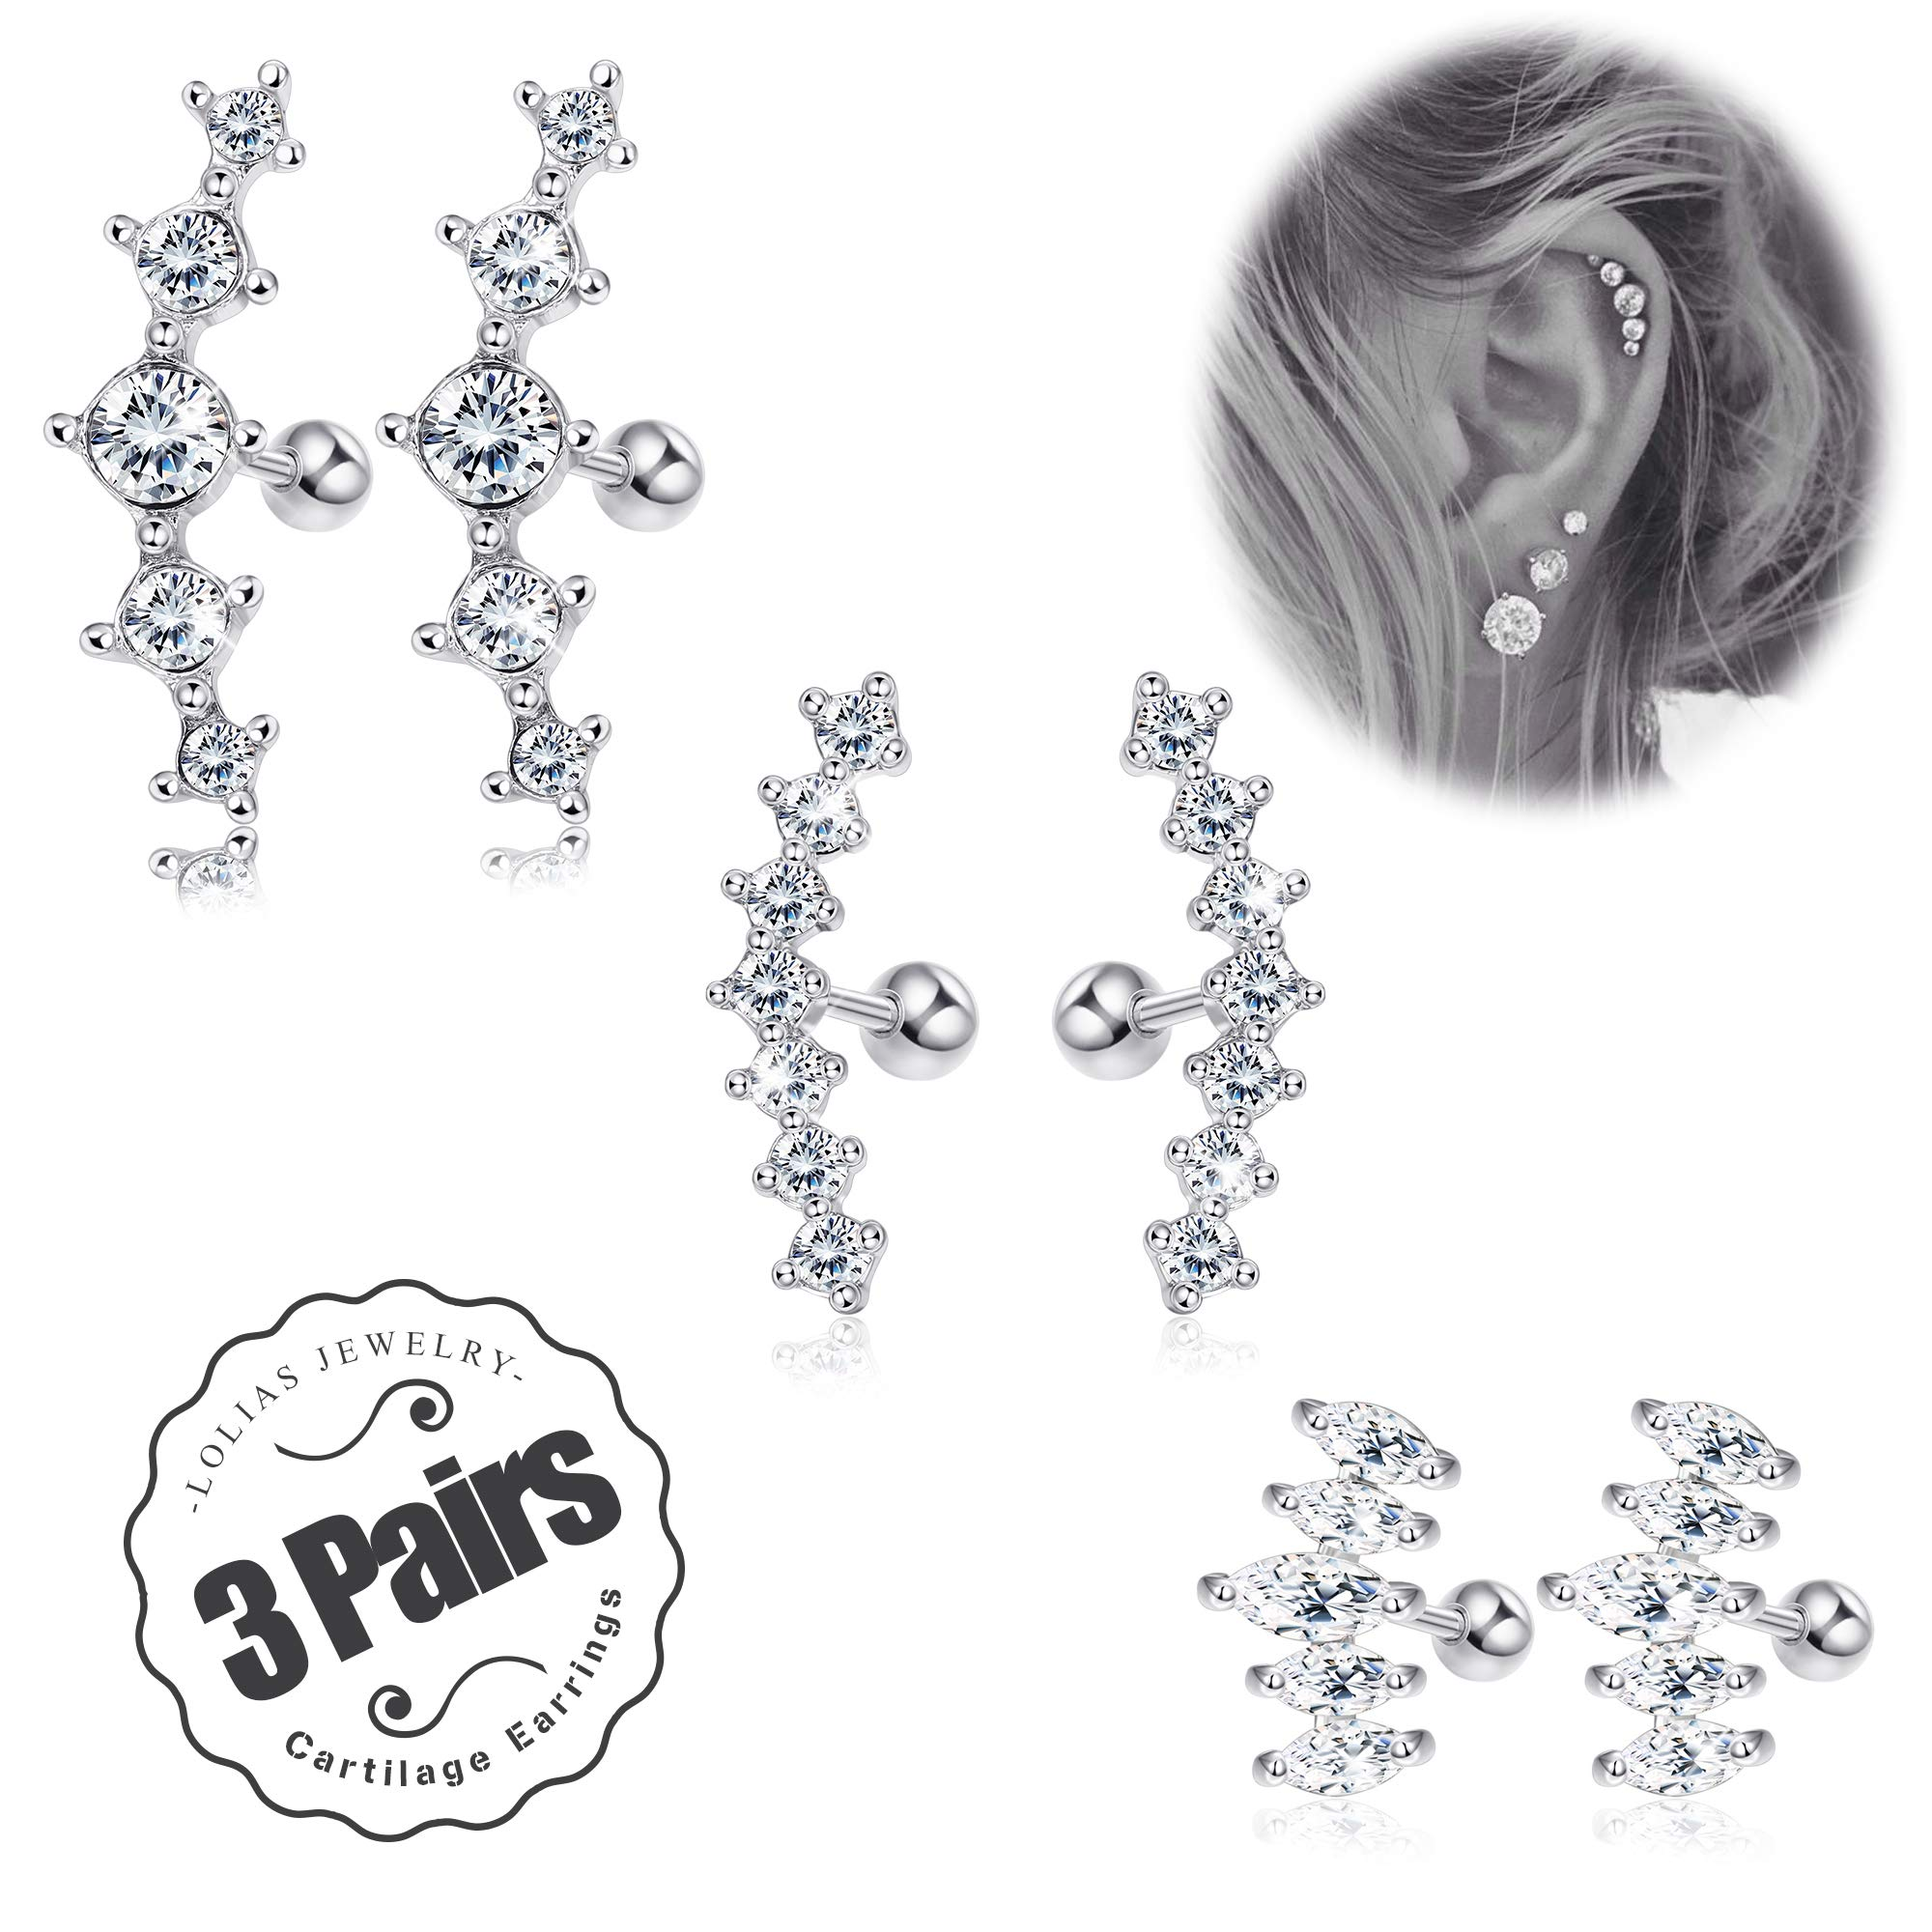 LOLIAS 3Pairs 16G Cartilage Stud Earrings Women Girls Conch Helix Piercing Jewelry Set